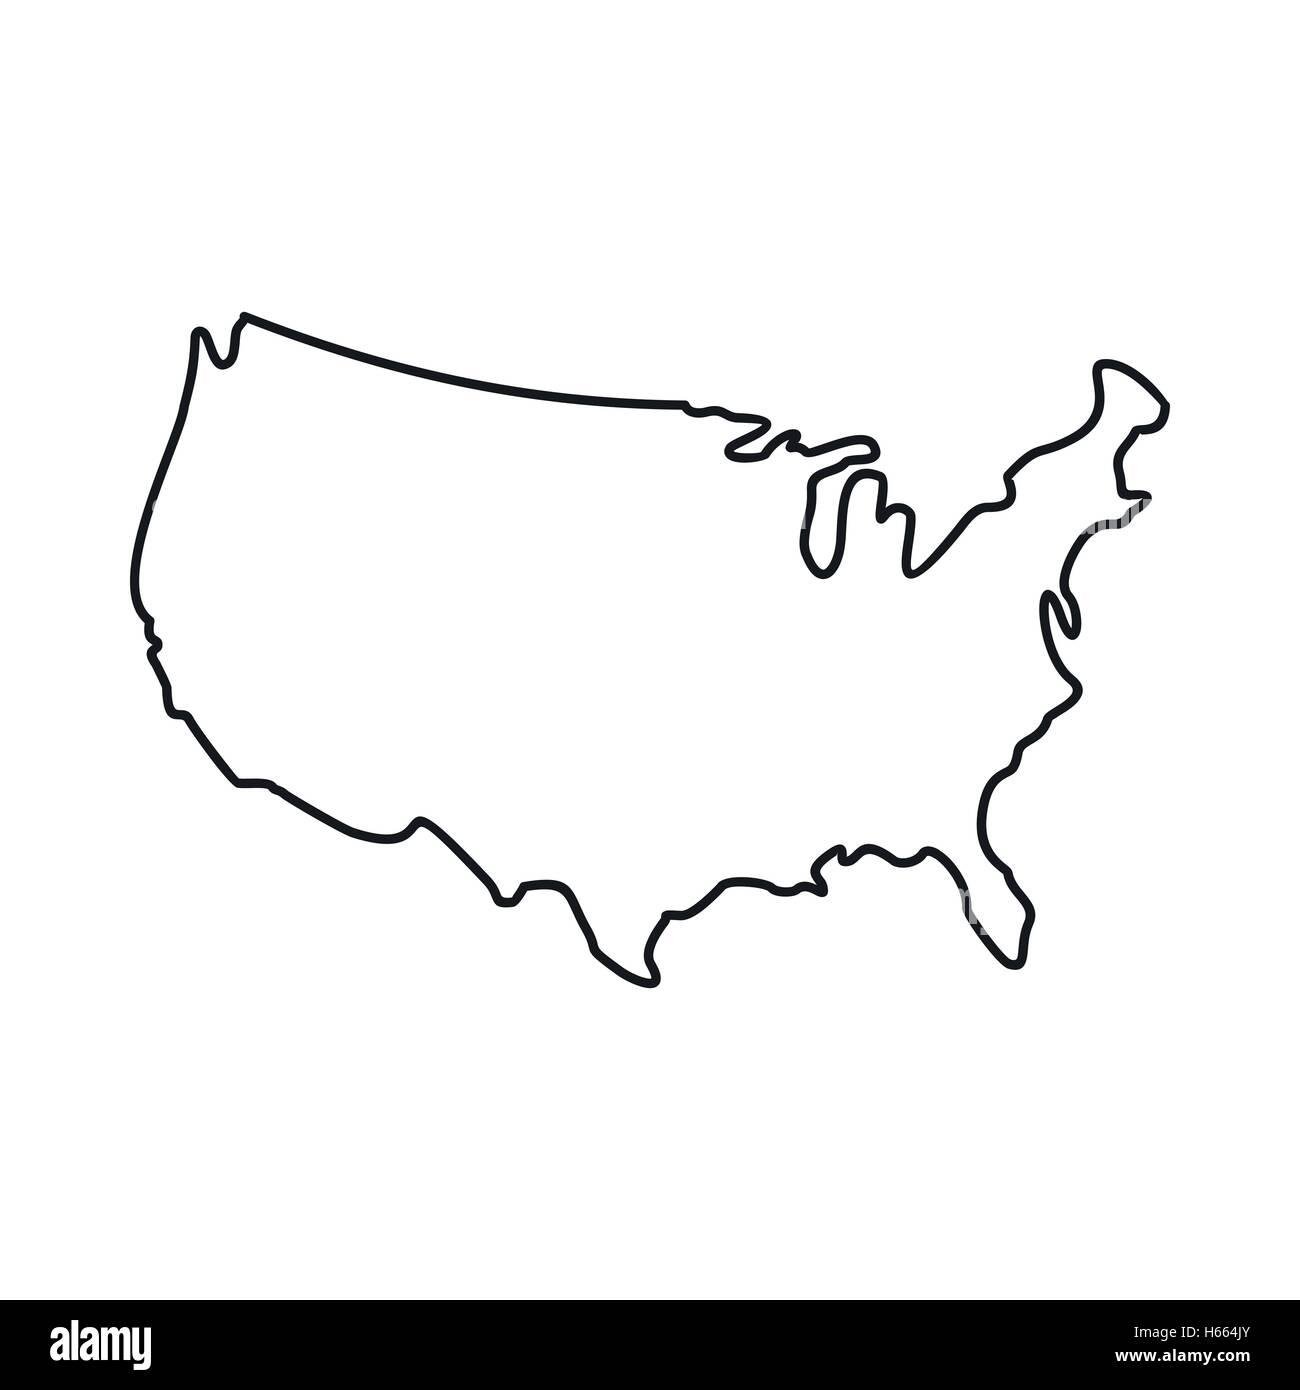 Line Drawing Usa : Line drawing world map stock photos